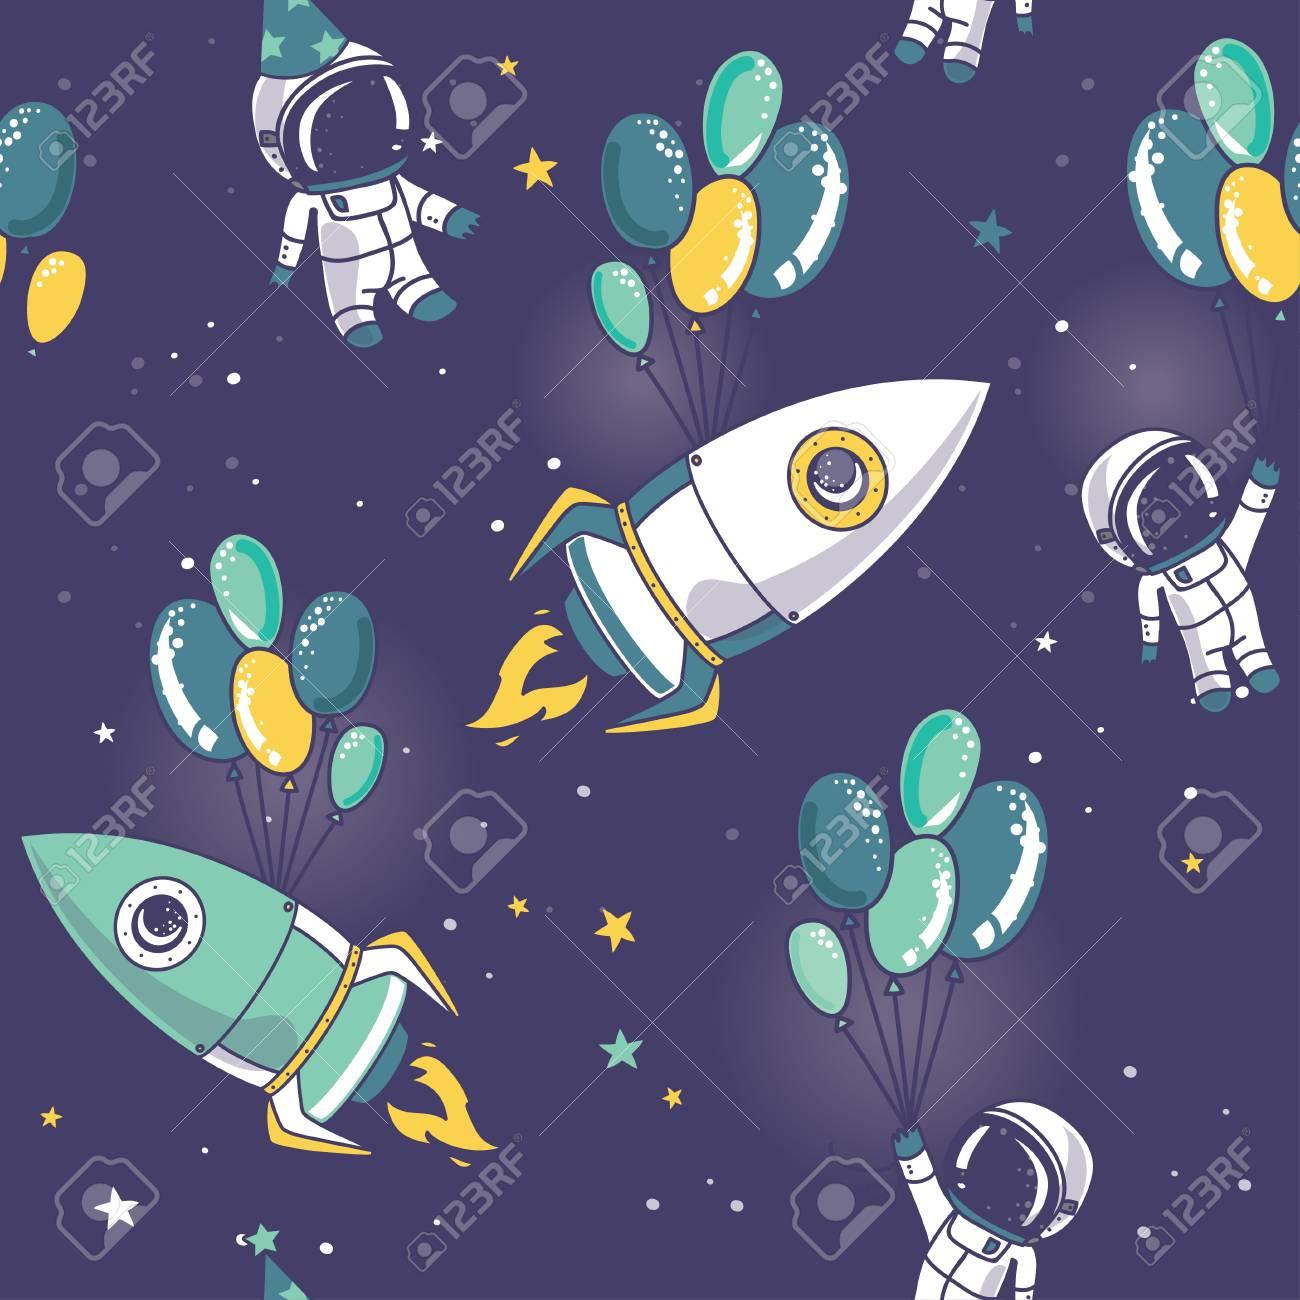 astronauts, rocket with balloons on seamless starry pattern, cosmic vector illustration - 74610515